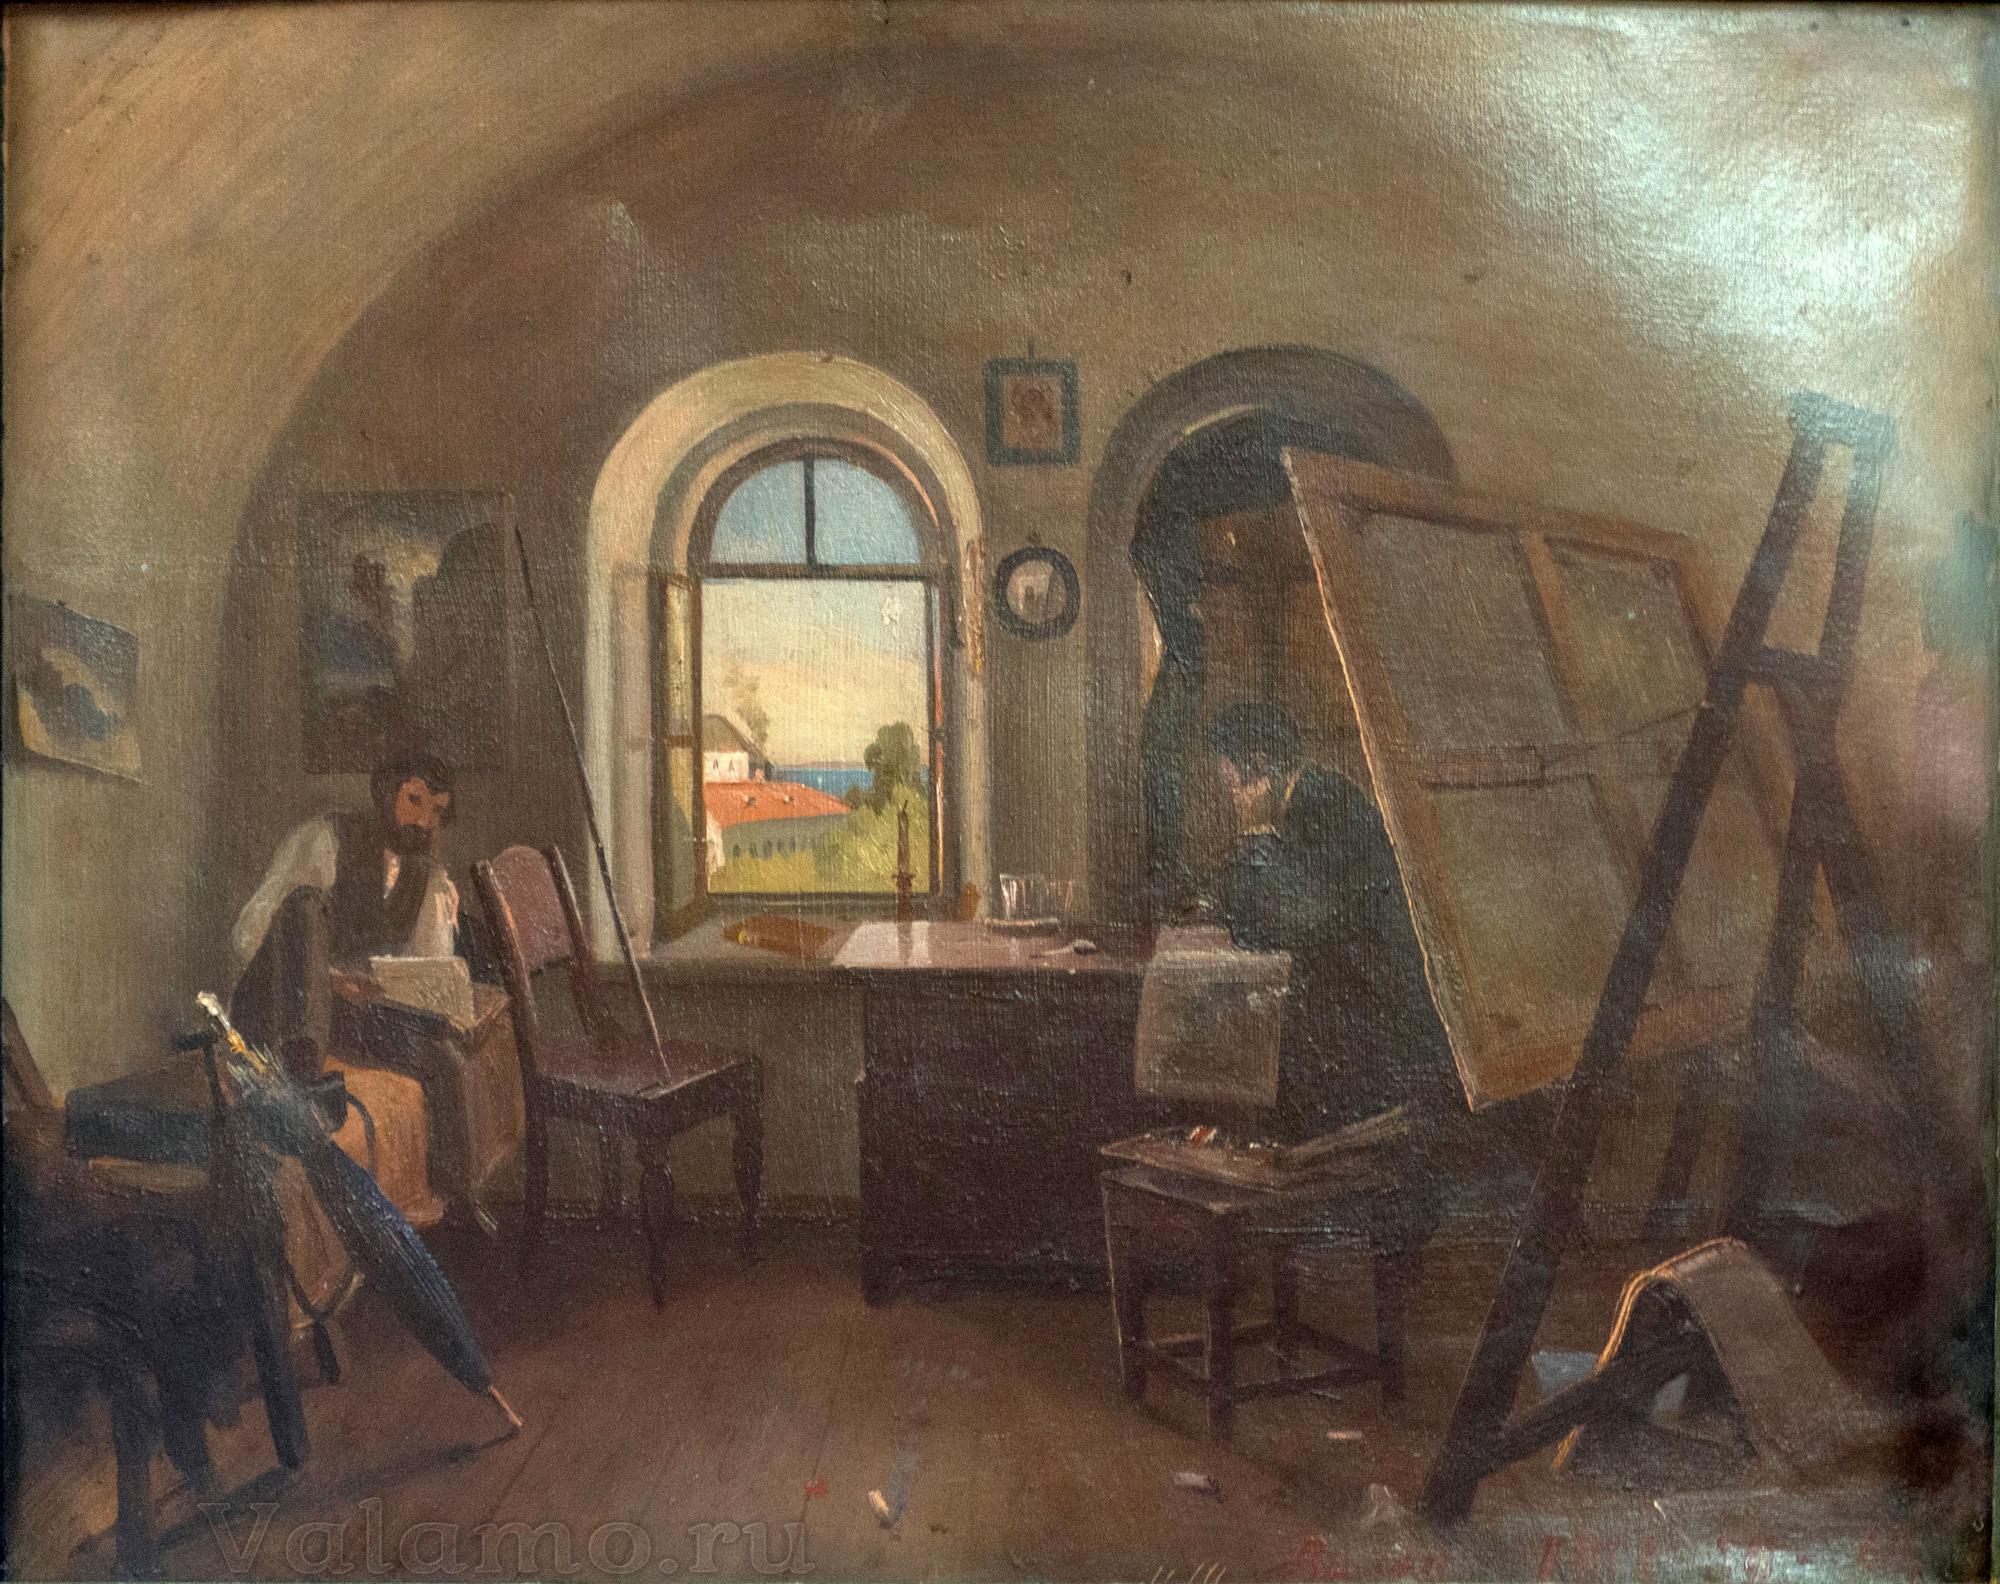 И.И.Шишкин. И.И.Шишкин и А.В Гине в мастерской на острове Валааме. 1860. Фото И. Сазеева